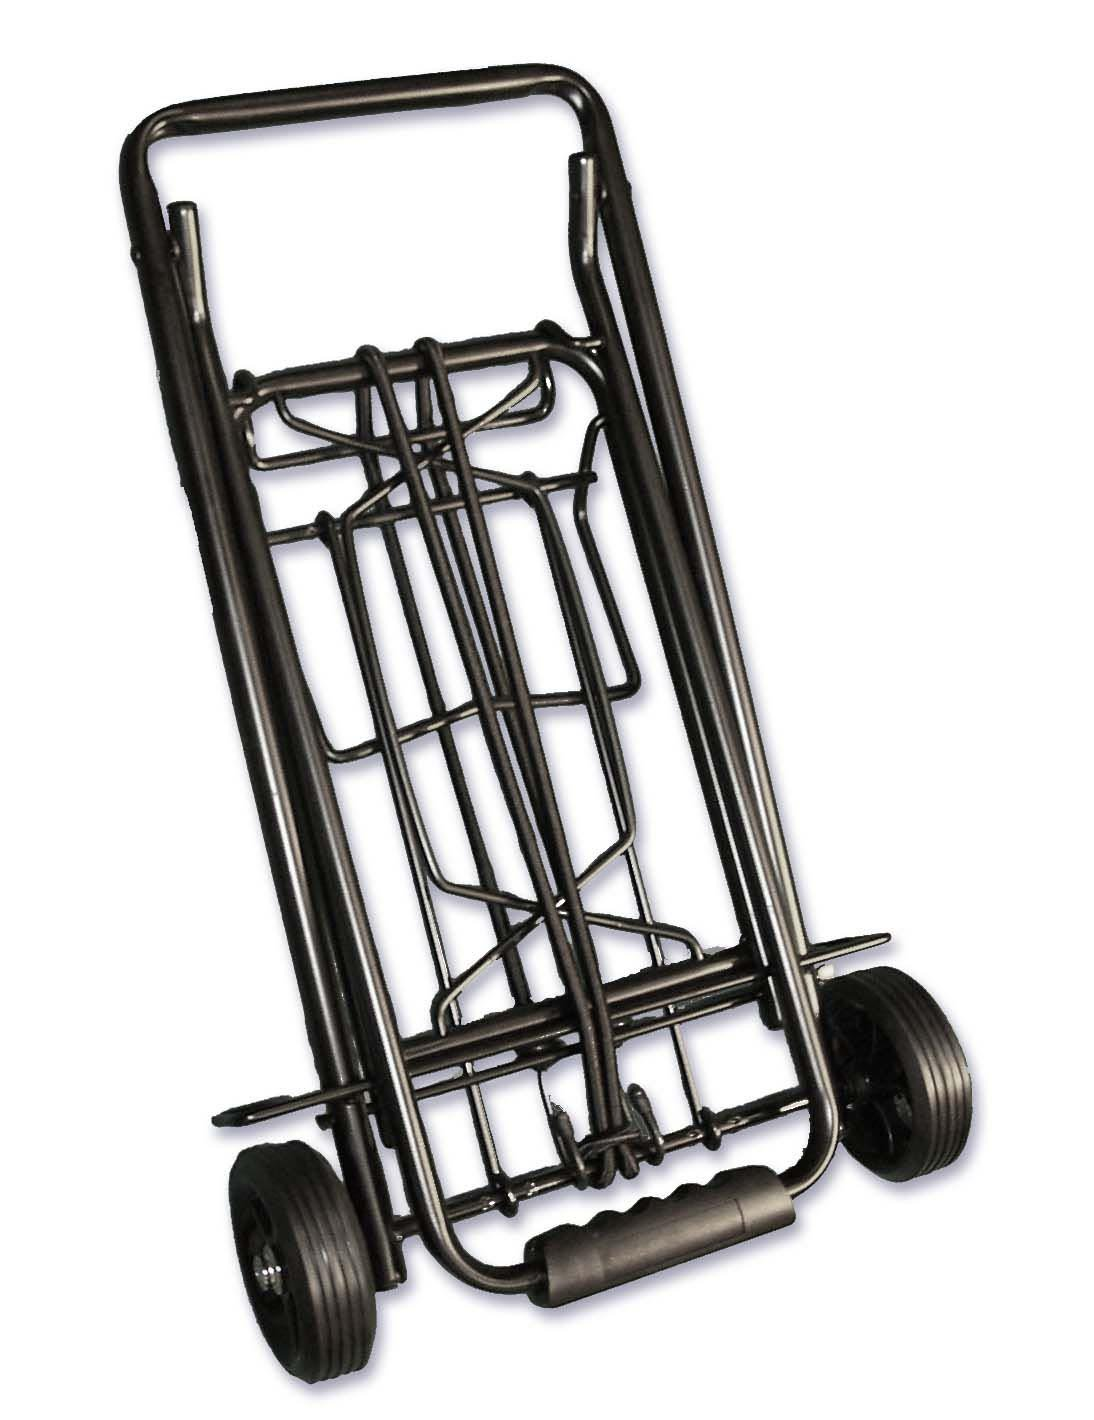 World's Best TravelKart Travel Luggage Cart, Black by World's Best